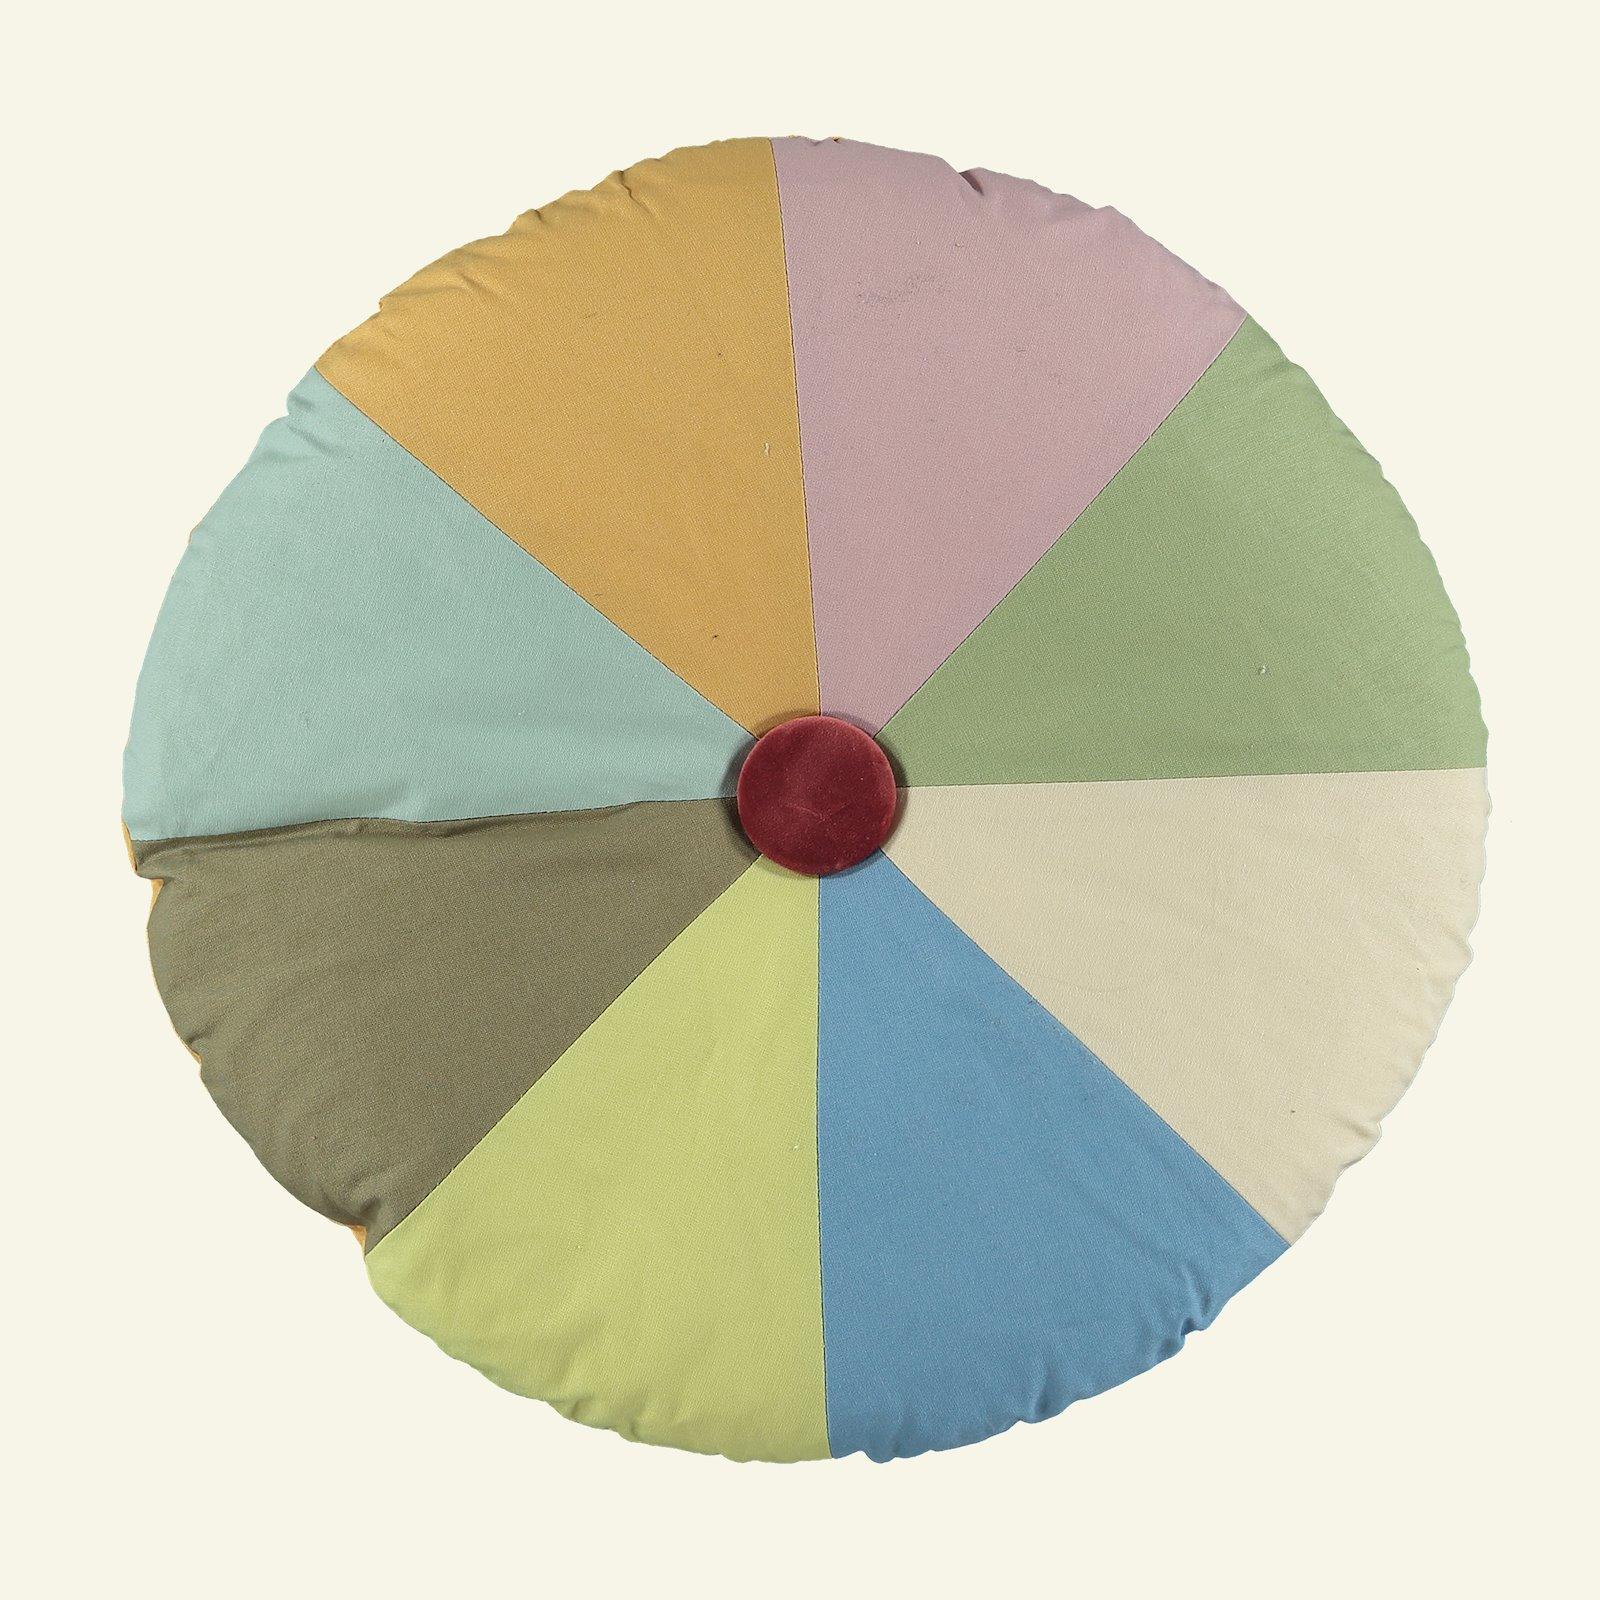 Luxury cotton warm curry p90272_4359_4221_4213_4310_4357_4295_4320_4361_40515_sskit